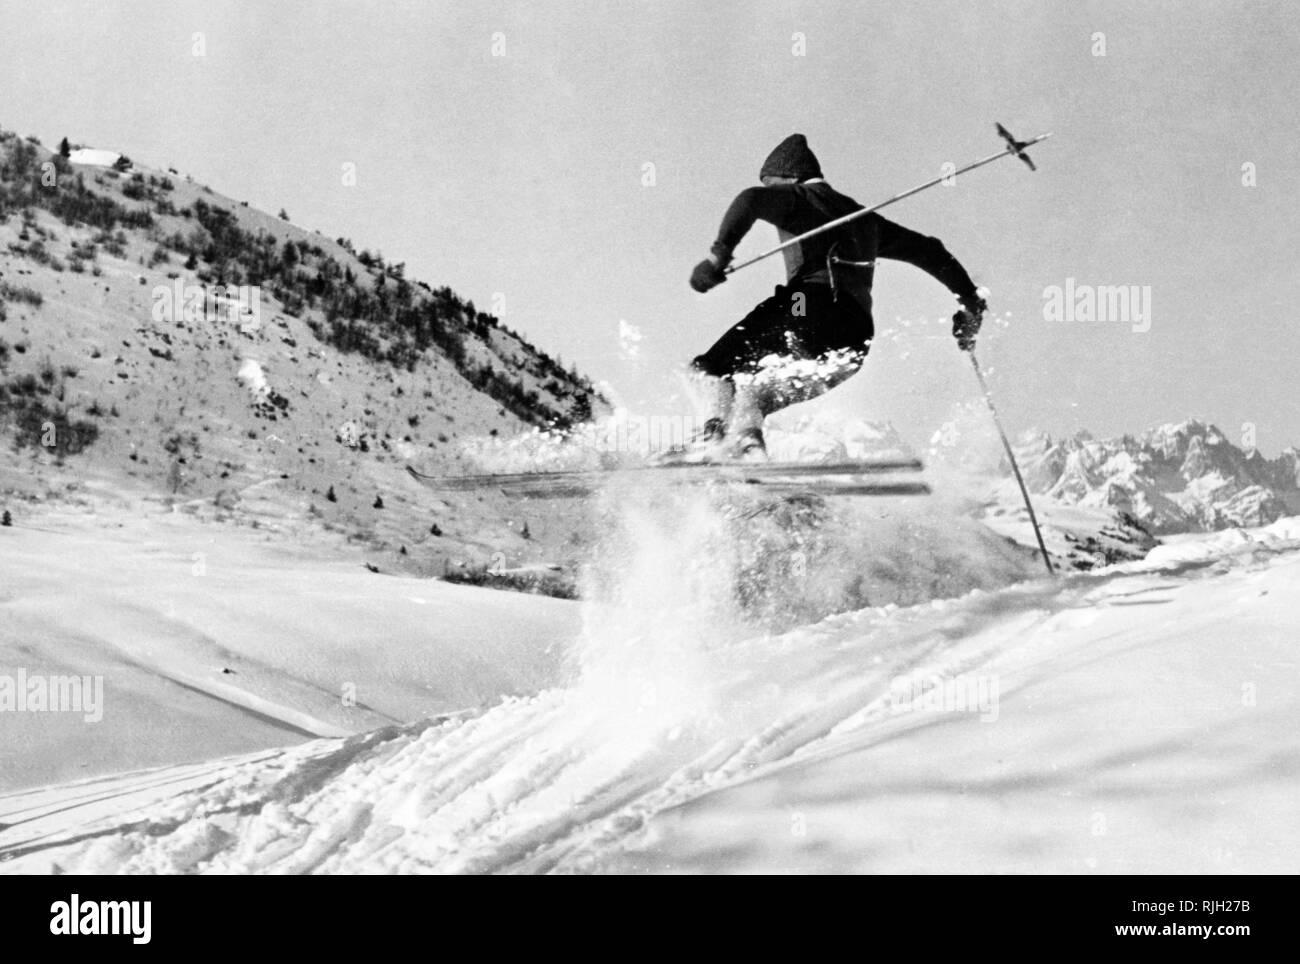 ski - Stock Image